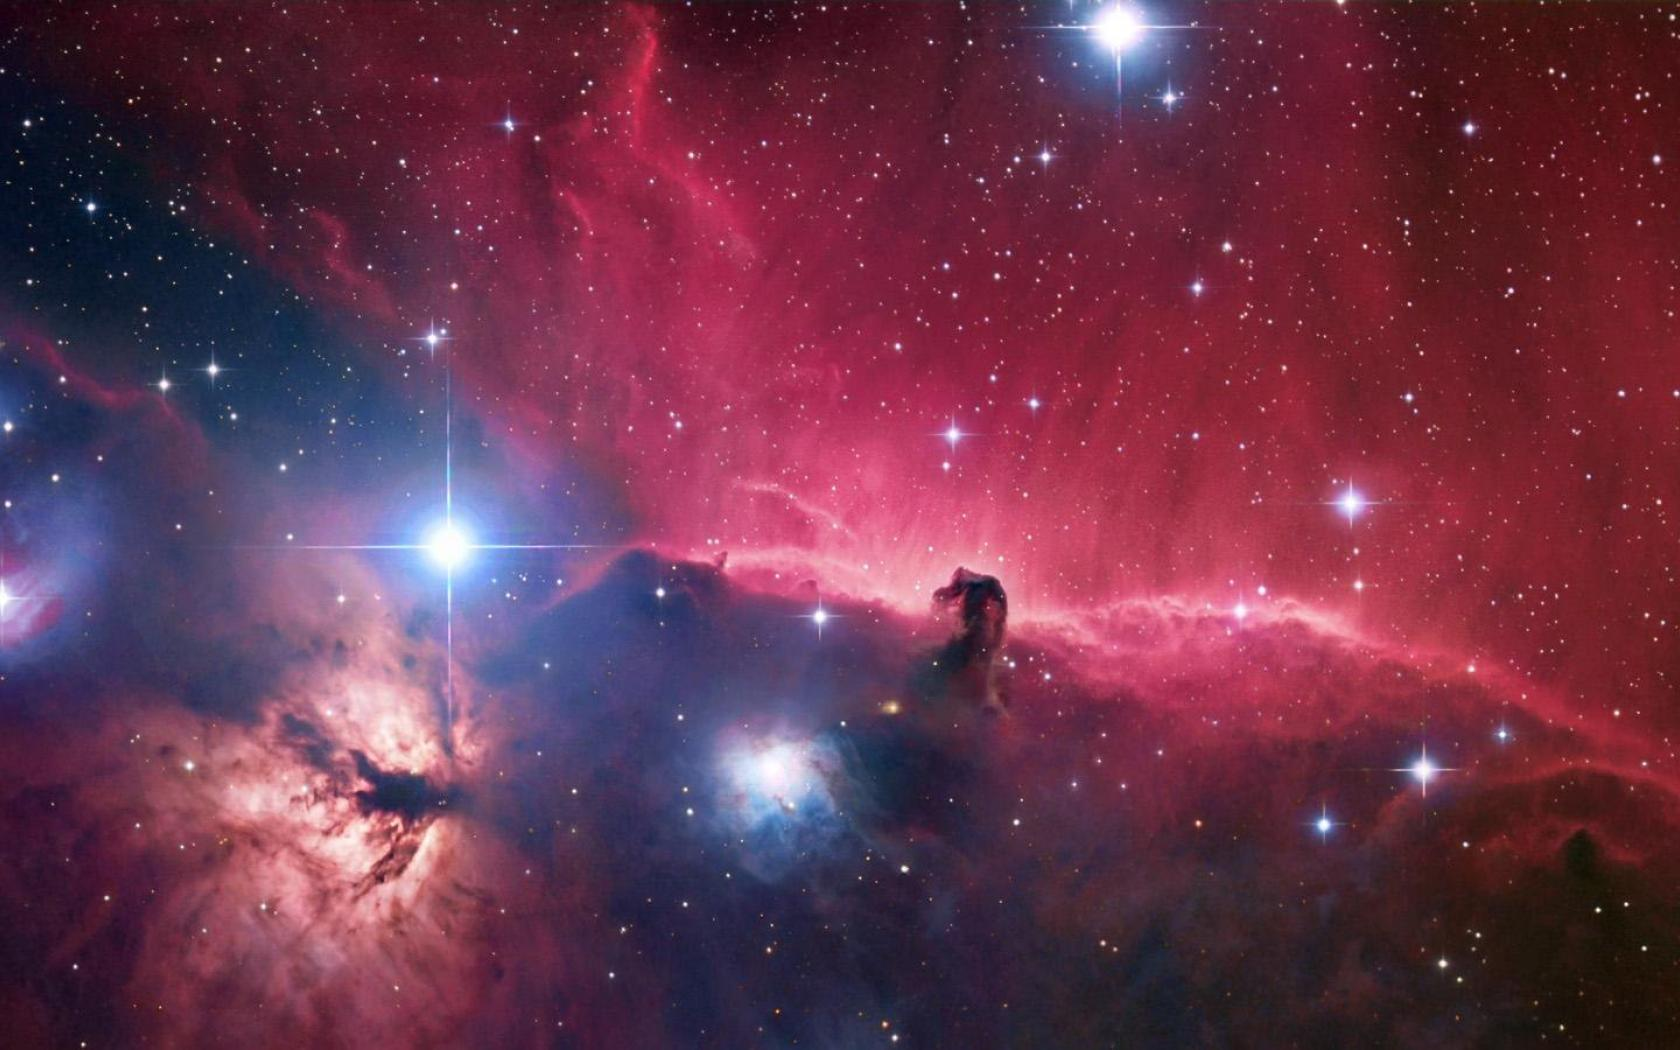 Nebula Wallpapers High Quality - WallpaperSafari